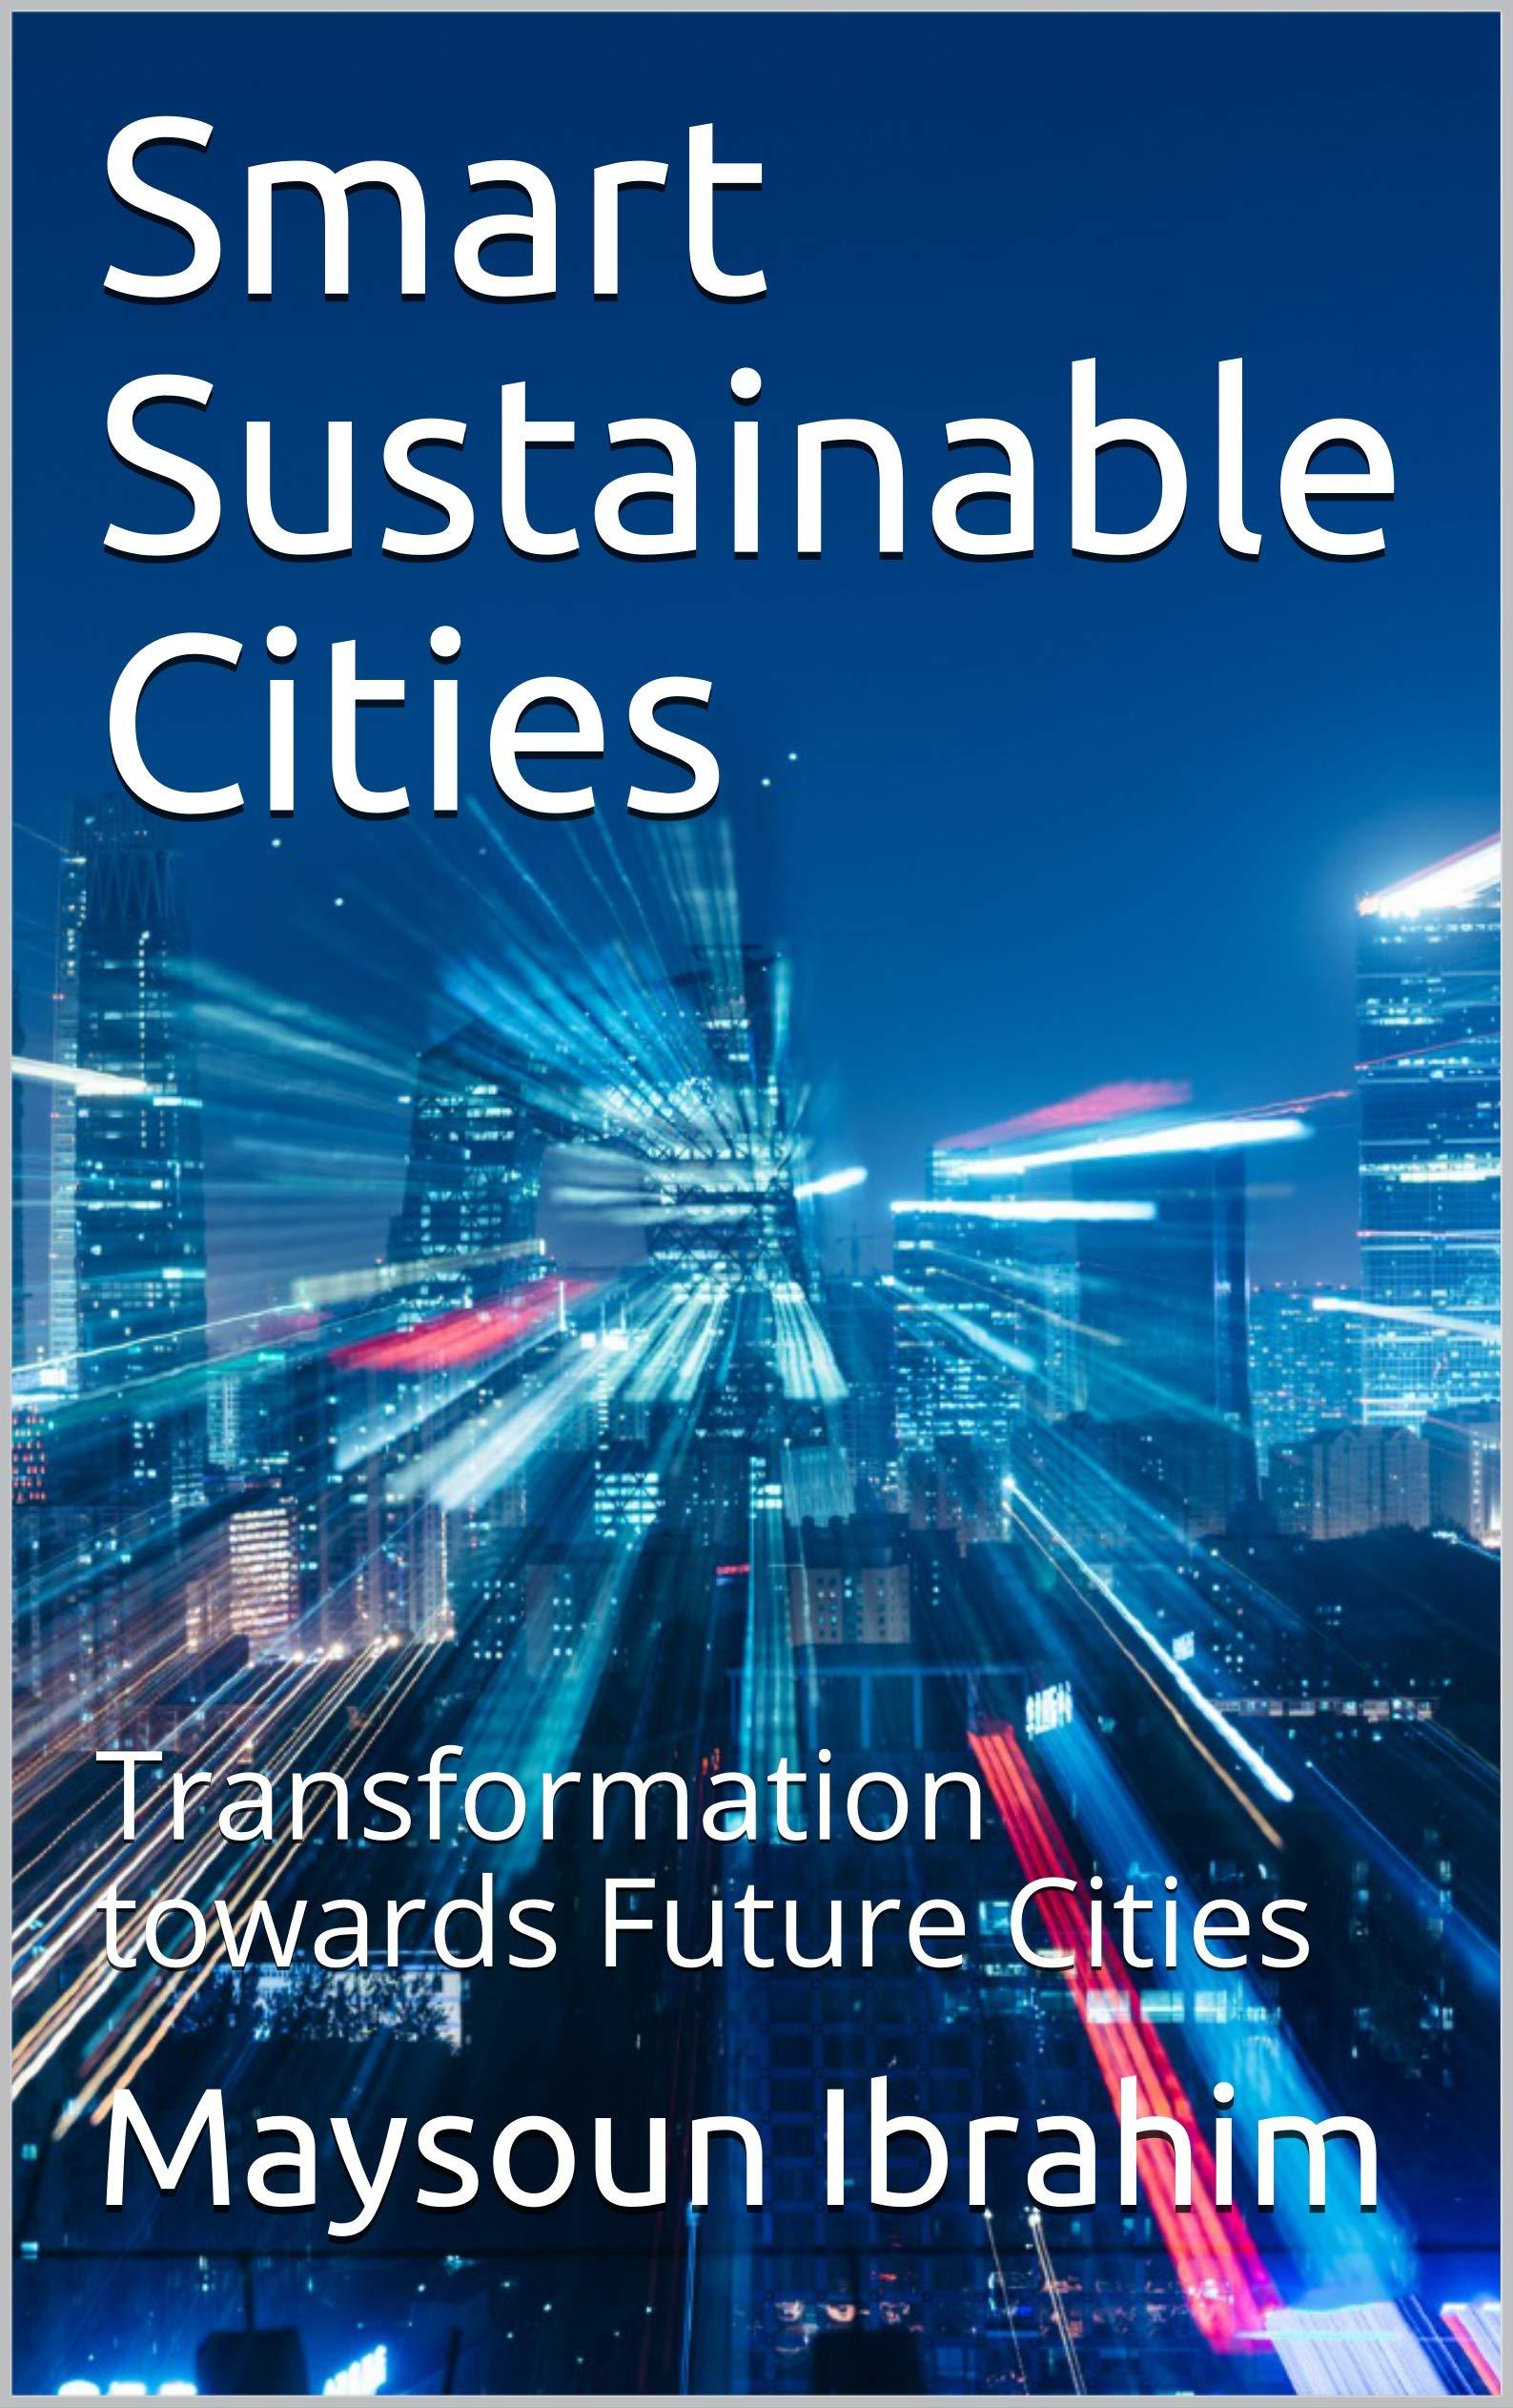 Smart Sustainable Cities: Transformation towards Future Cities